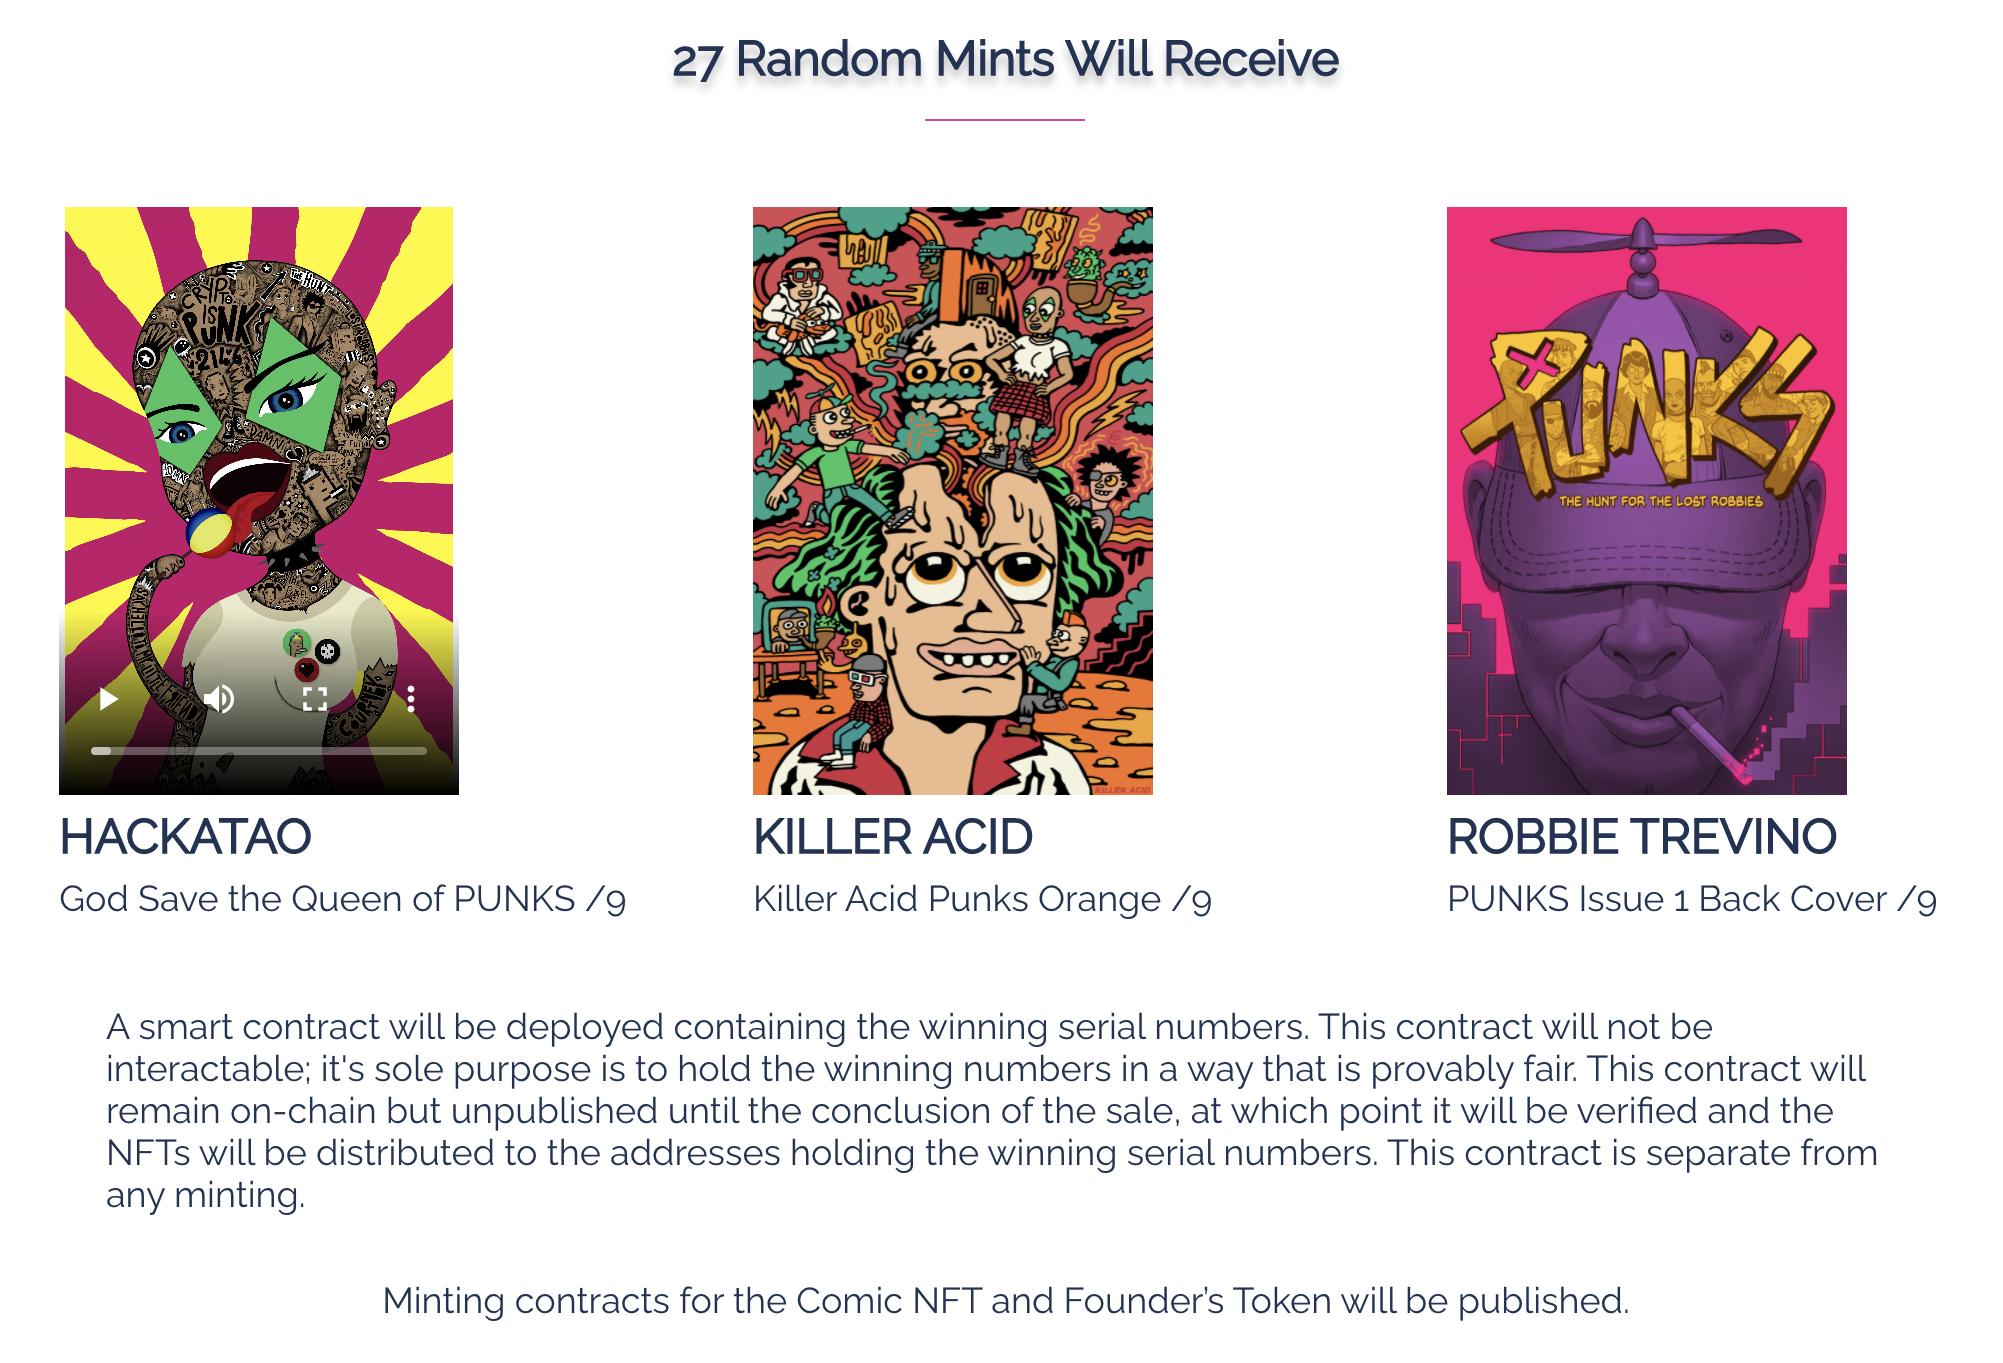 27 random punks Mint